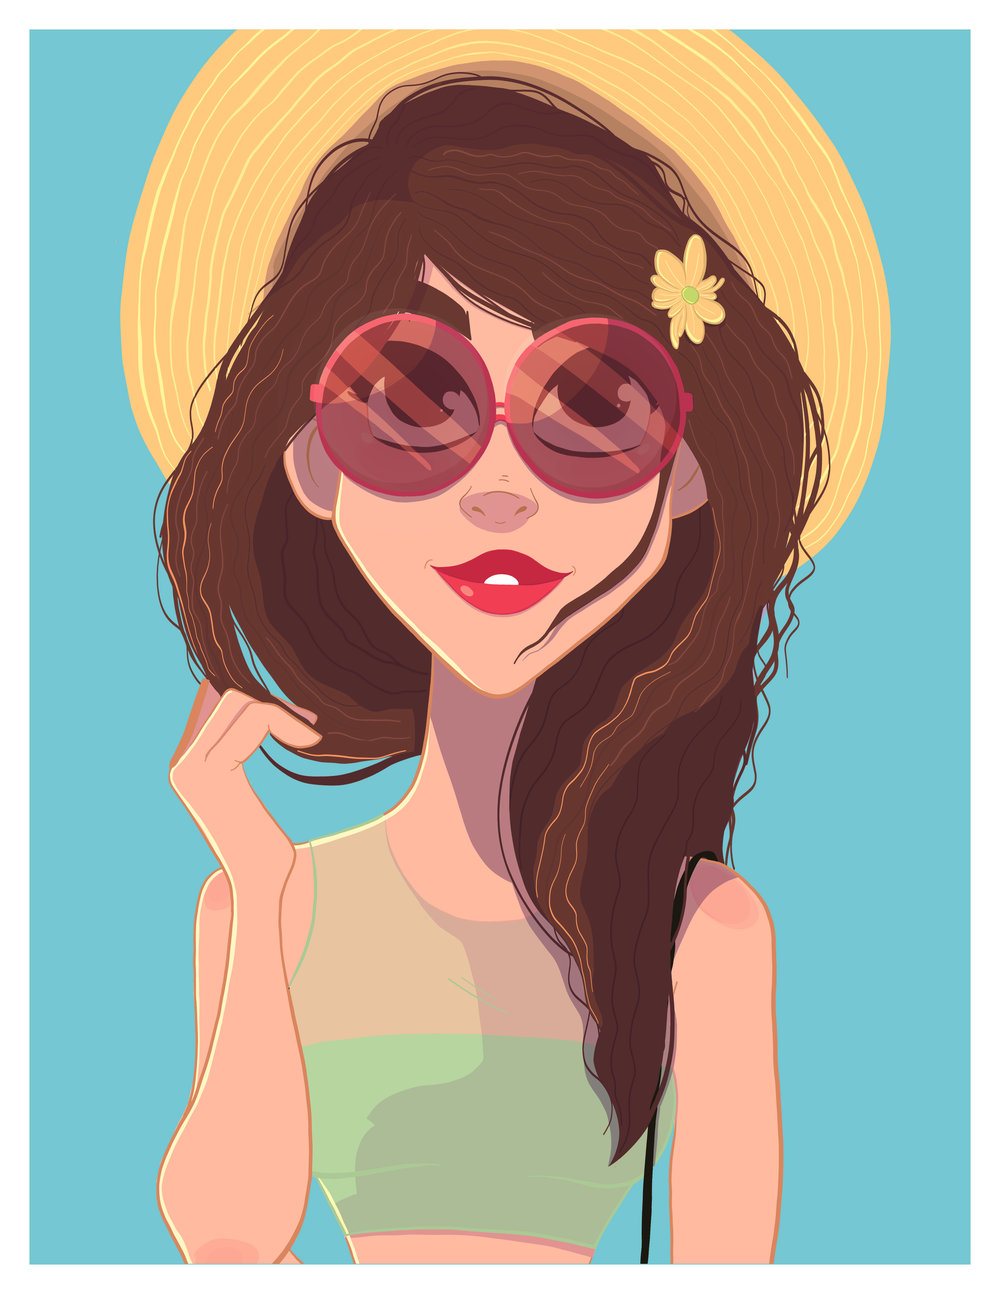 Sunglass_girl_Border.jpg